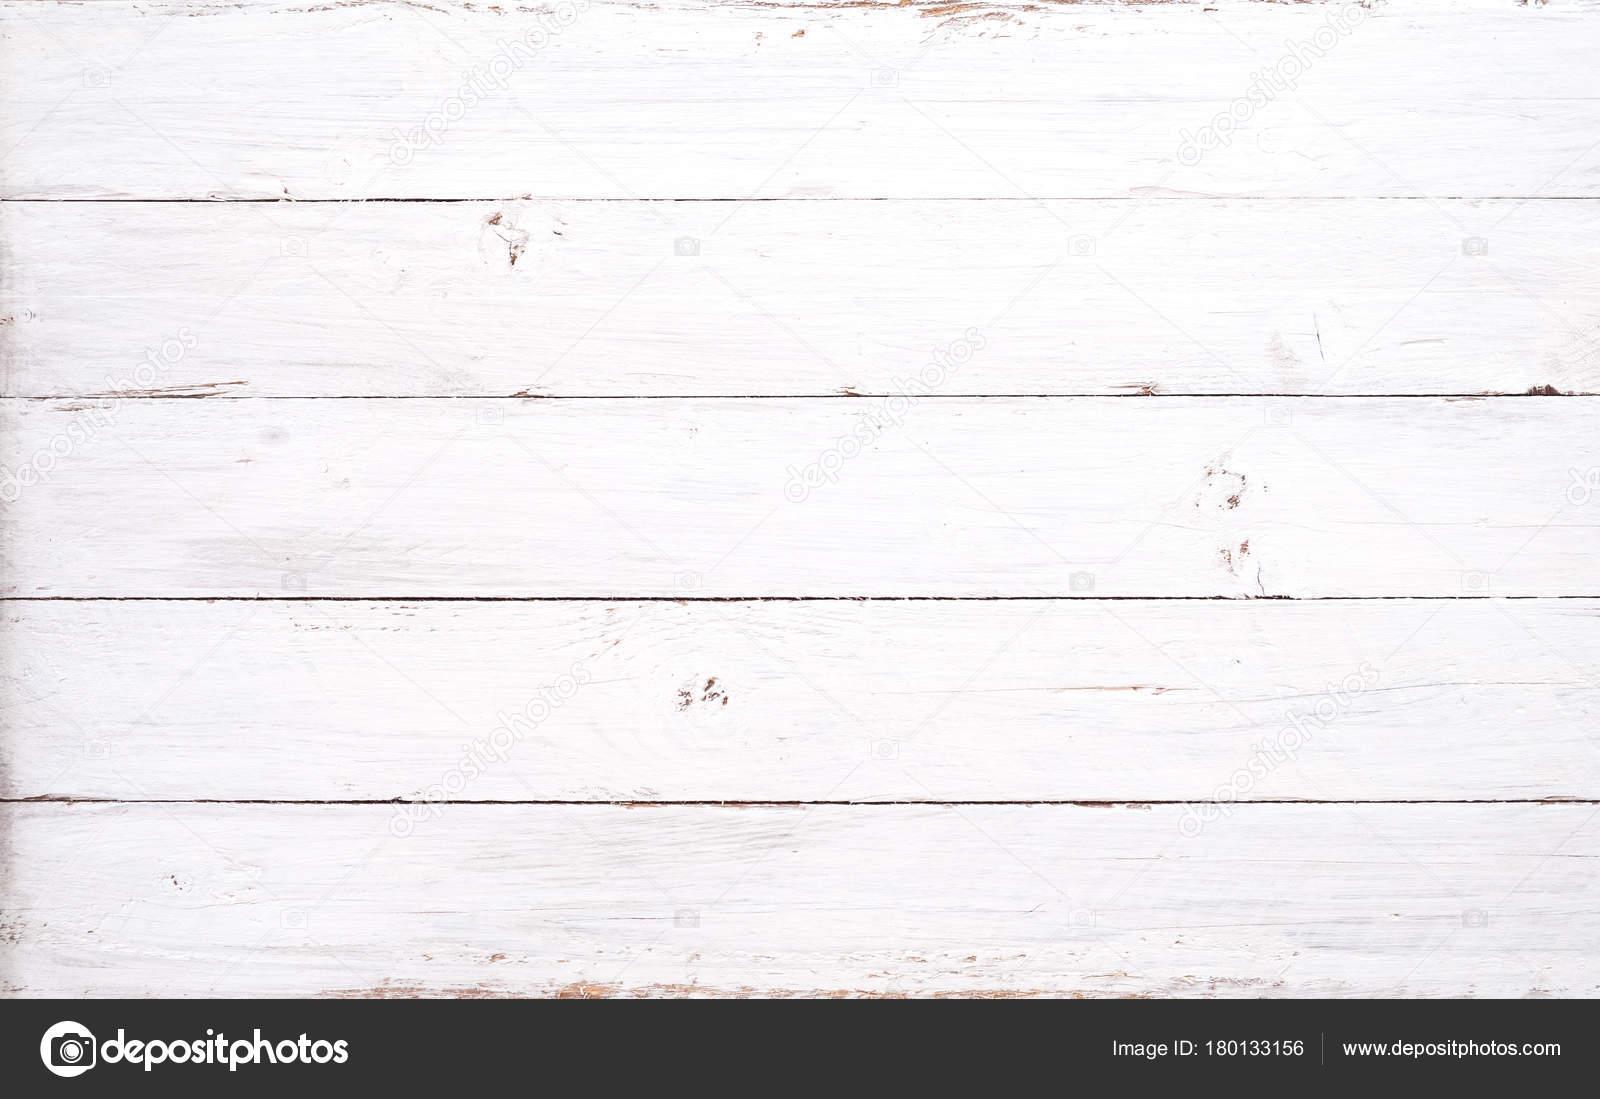 Legno Bianco Vintage : Priorità bassa legno bianco vintage vecchio sopravvissuto